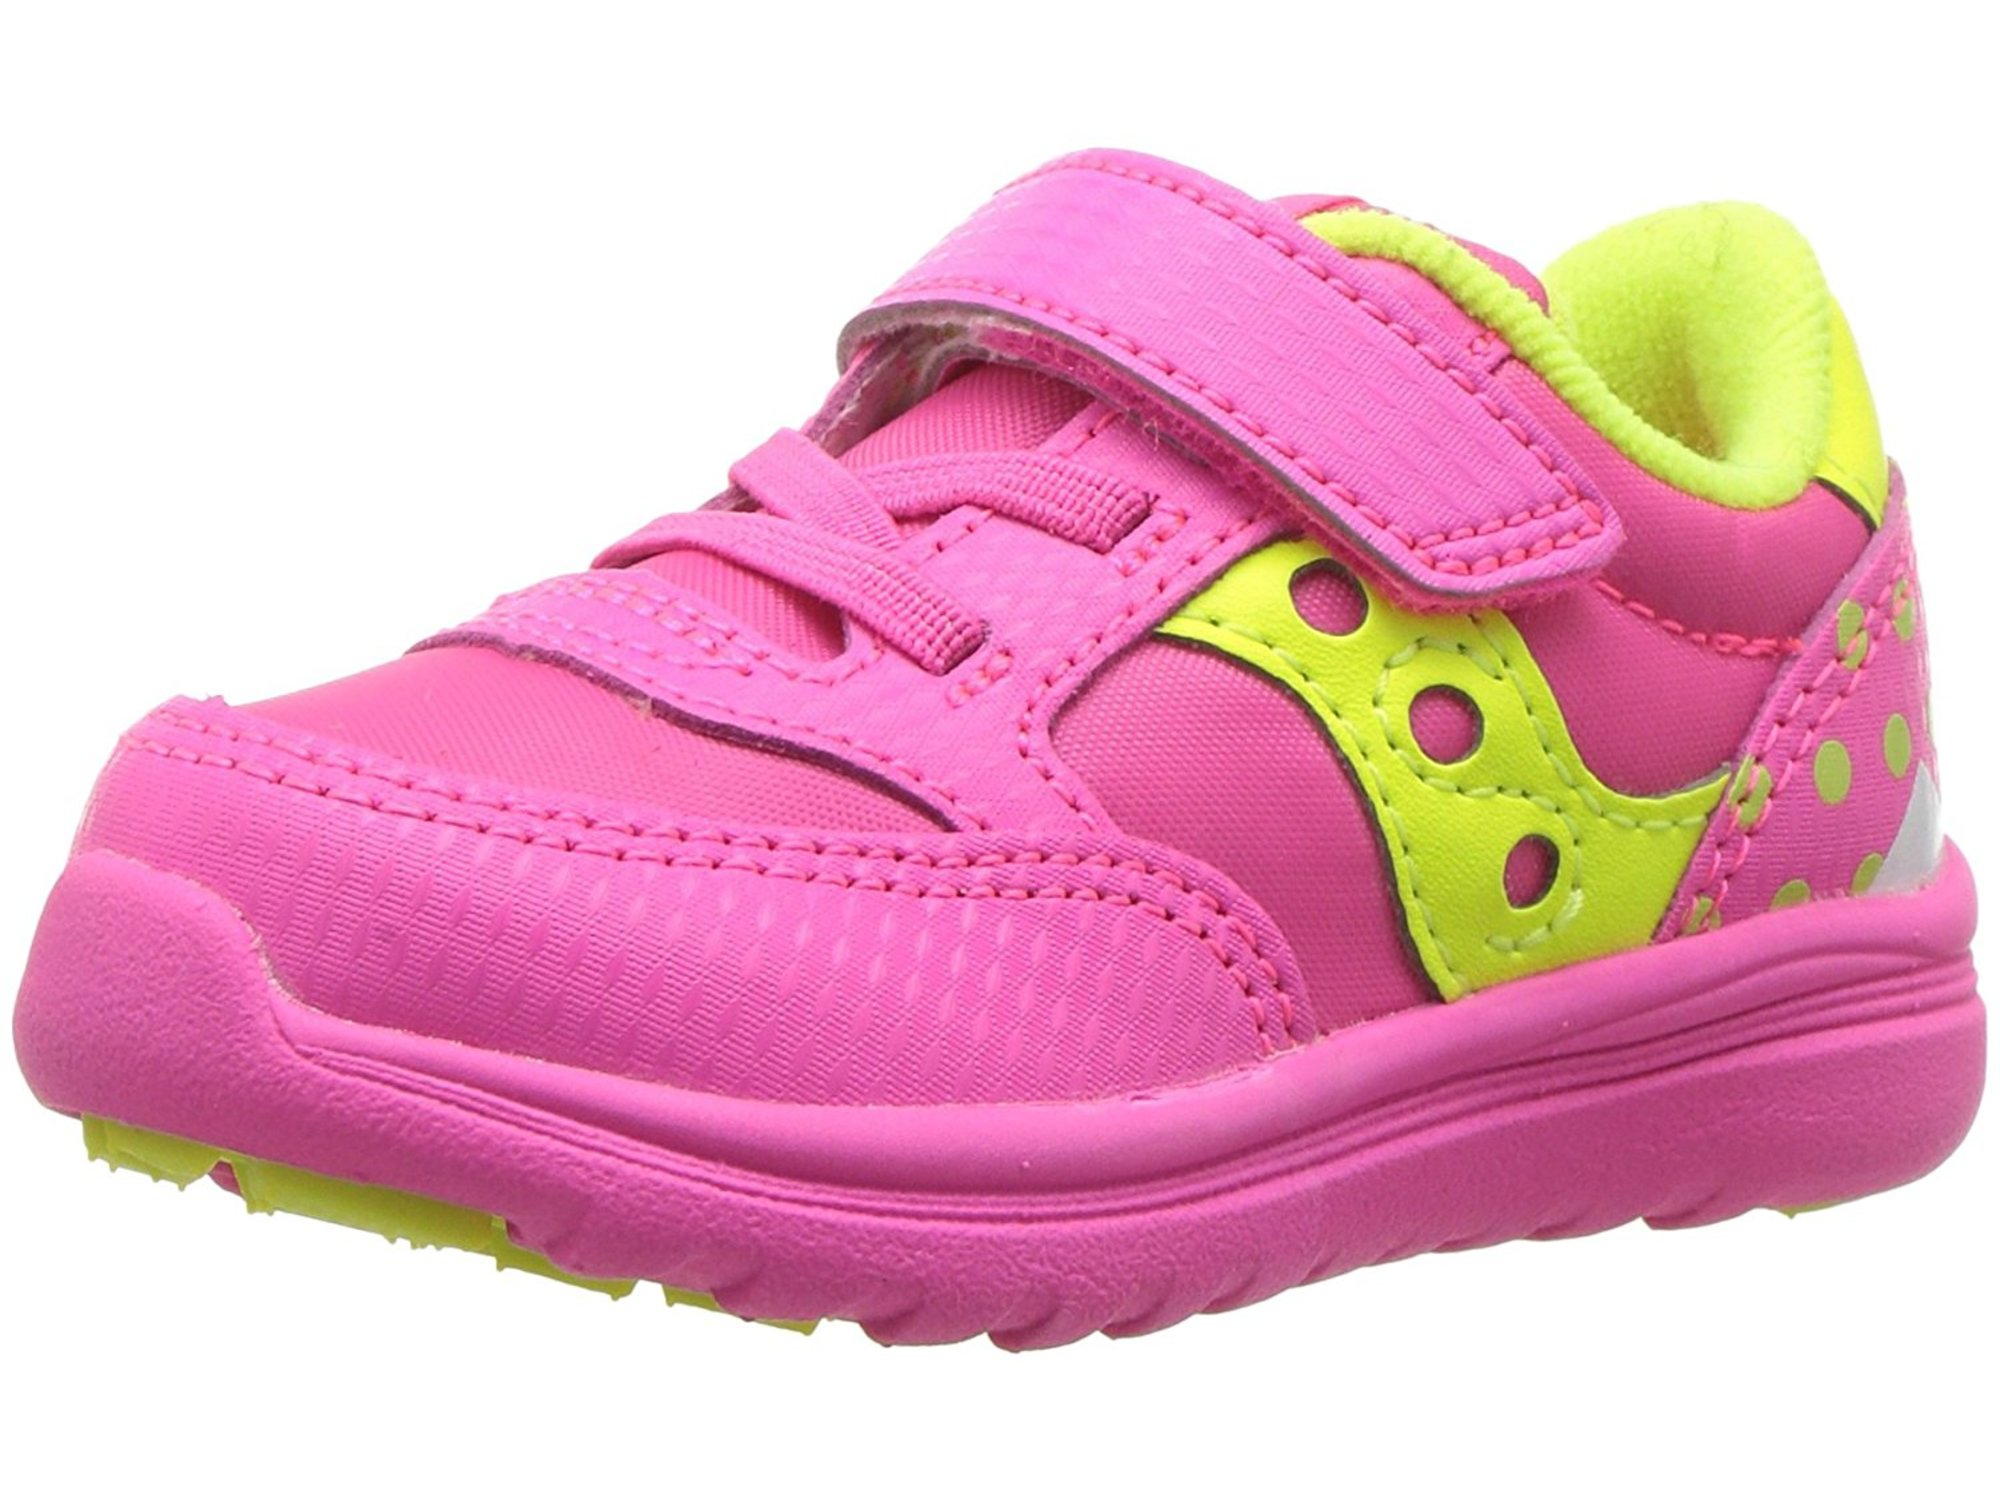 Toddler Saucony Baby Jazz Lite Sneaker Grey//Red Pirate Suede//Mesh